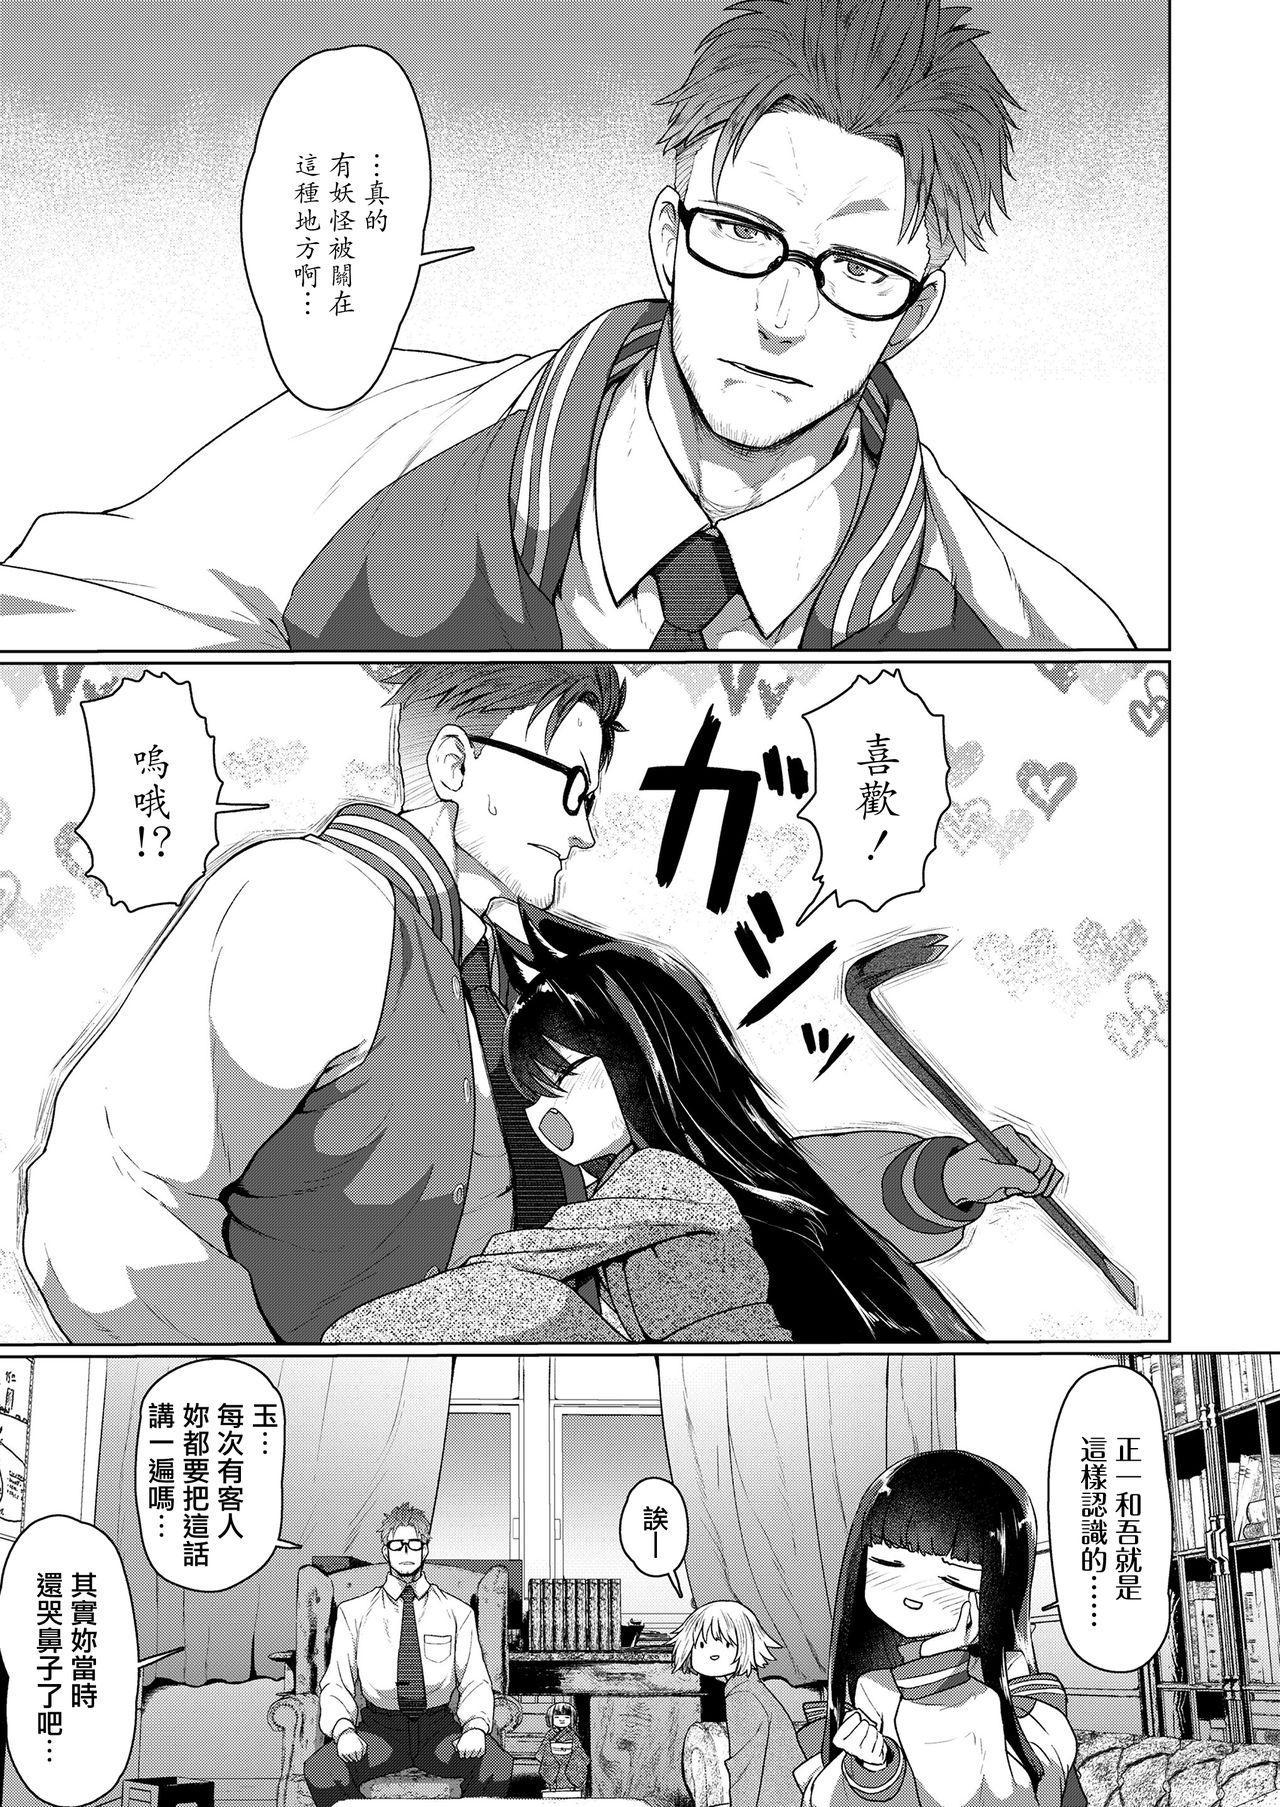 Kyouju to Bakeneko | 教授與貓妖 3